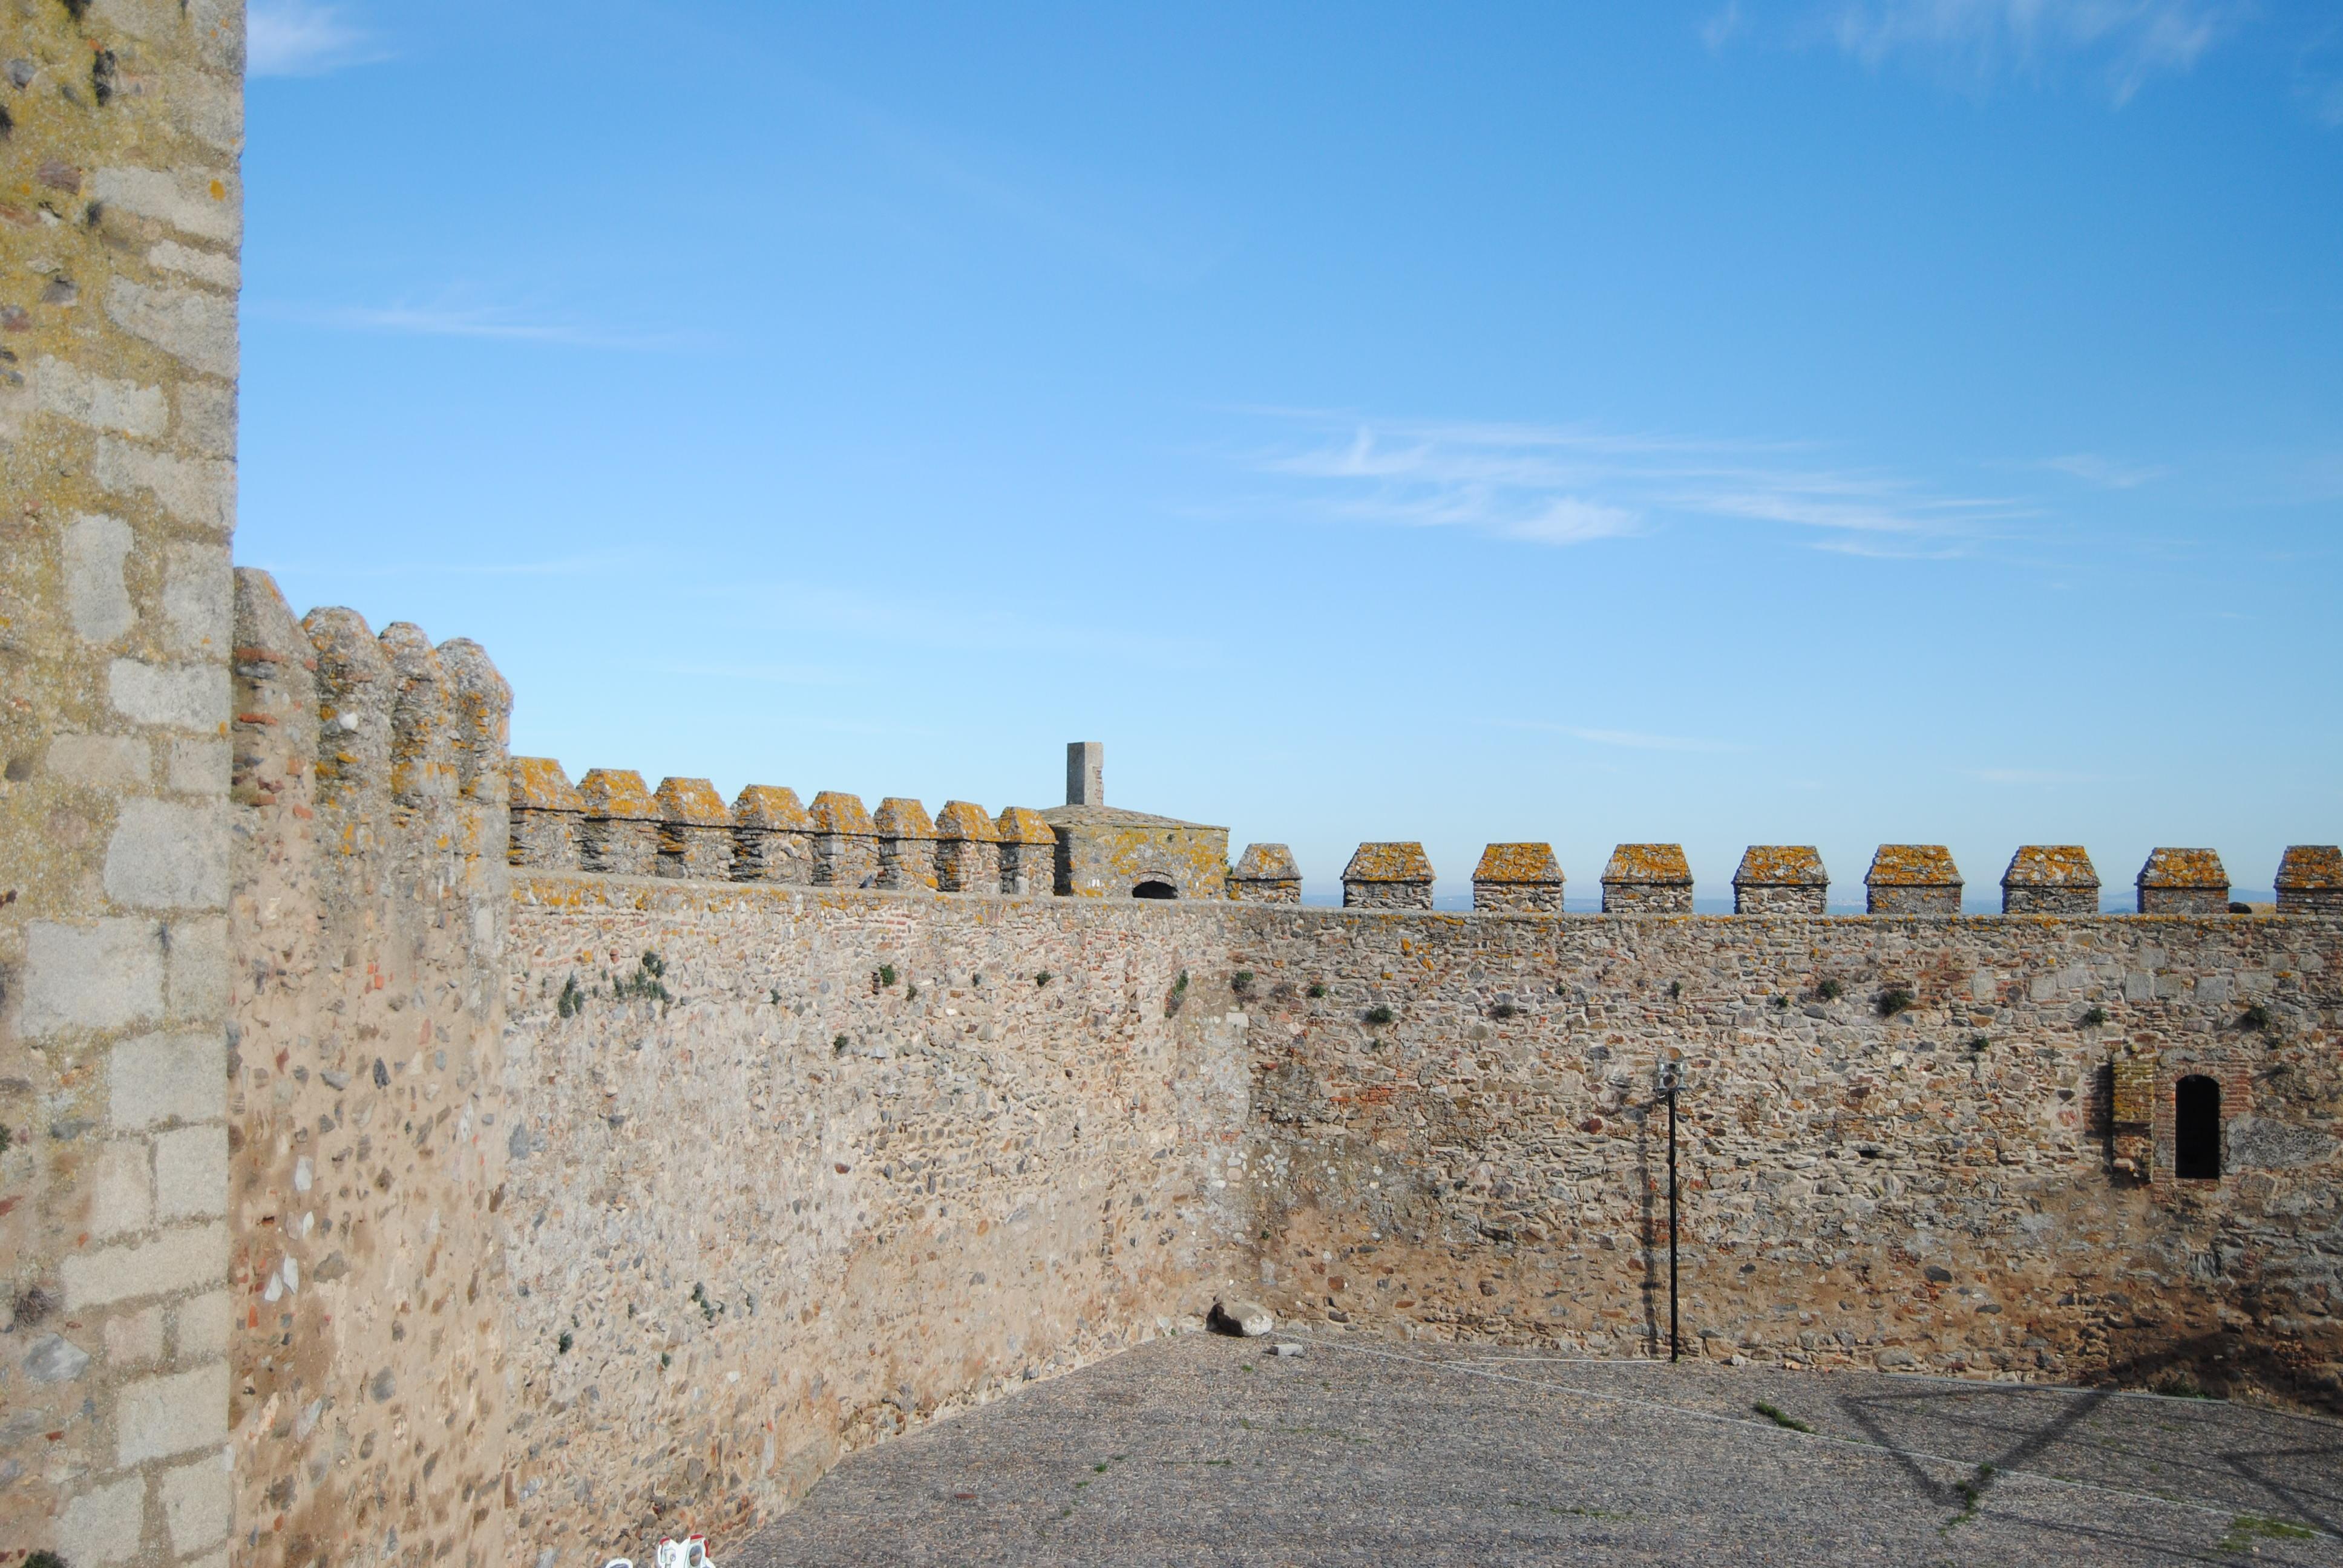 File:Castillo de Segura de León (15894191230).jpg - Wikimedia Commons